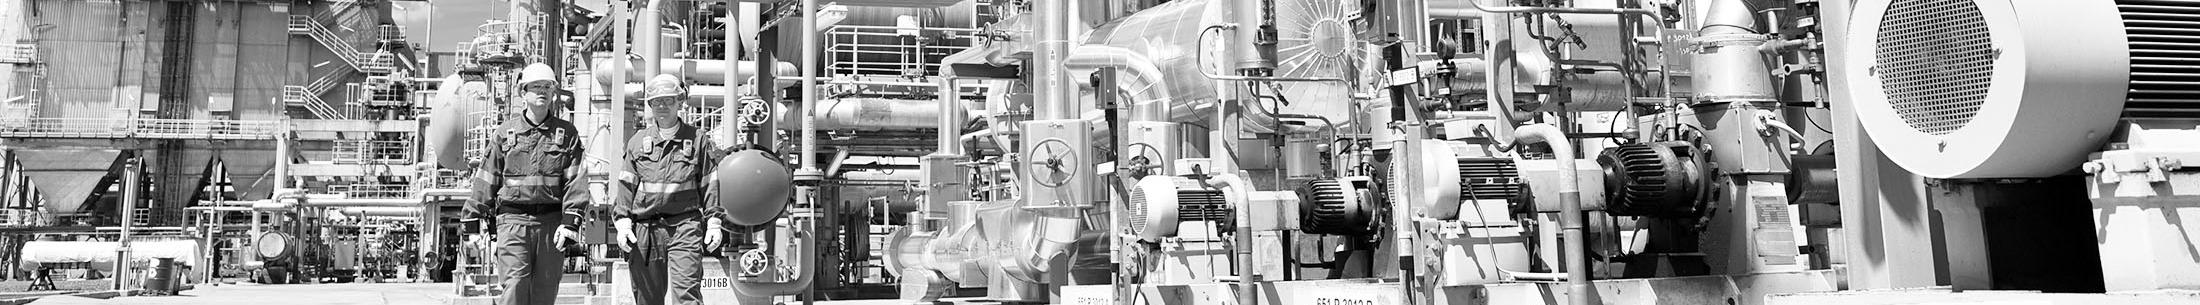 Petrochemical - Rotolok UK